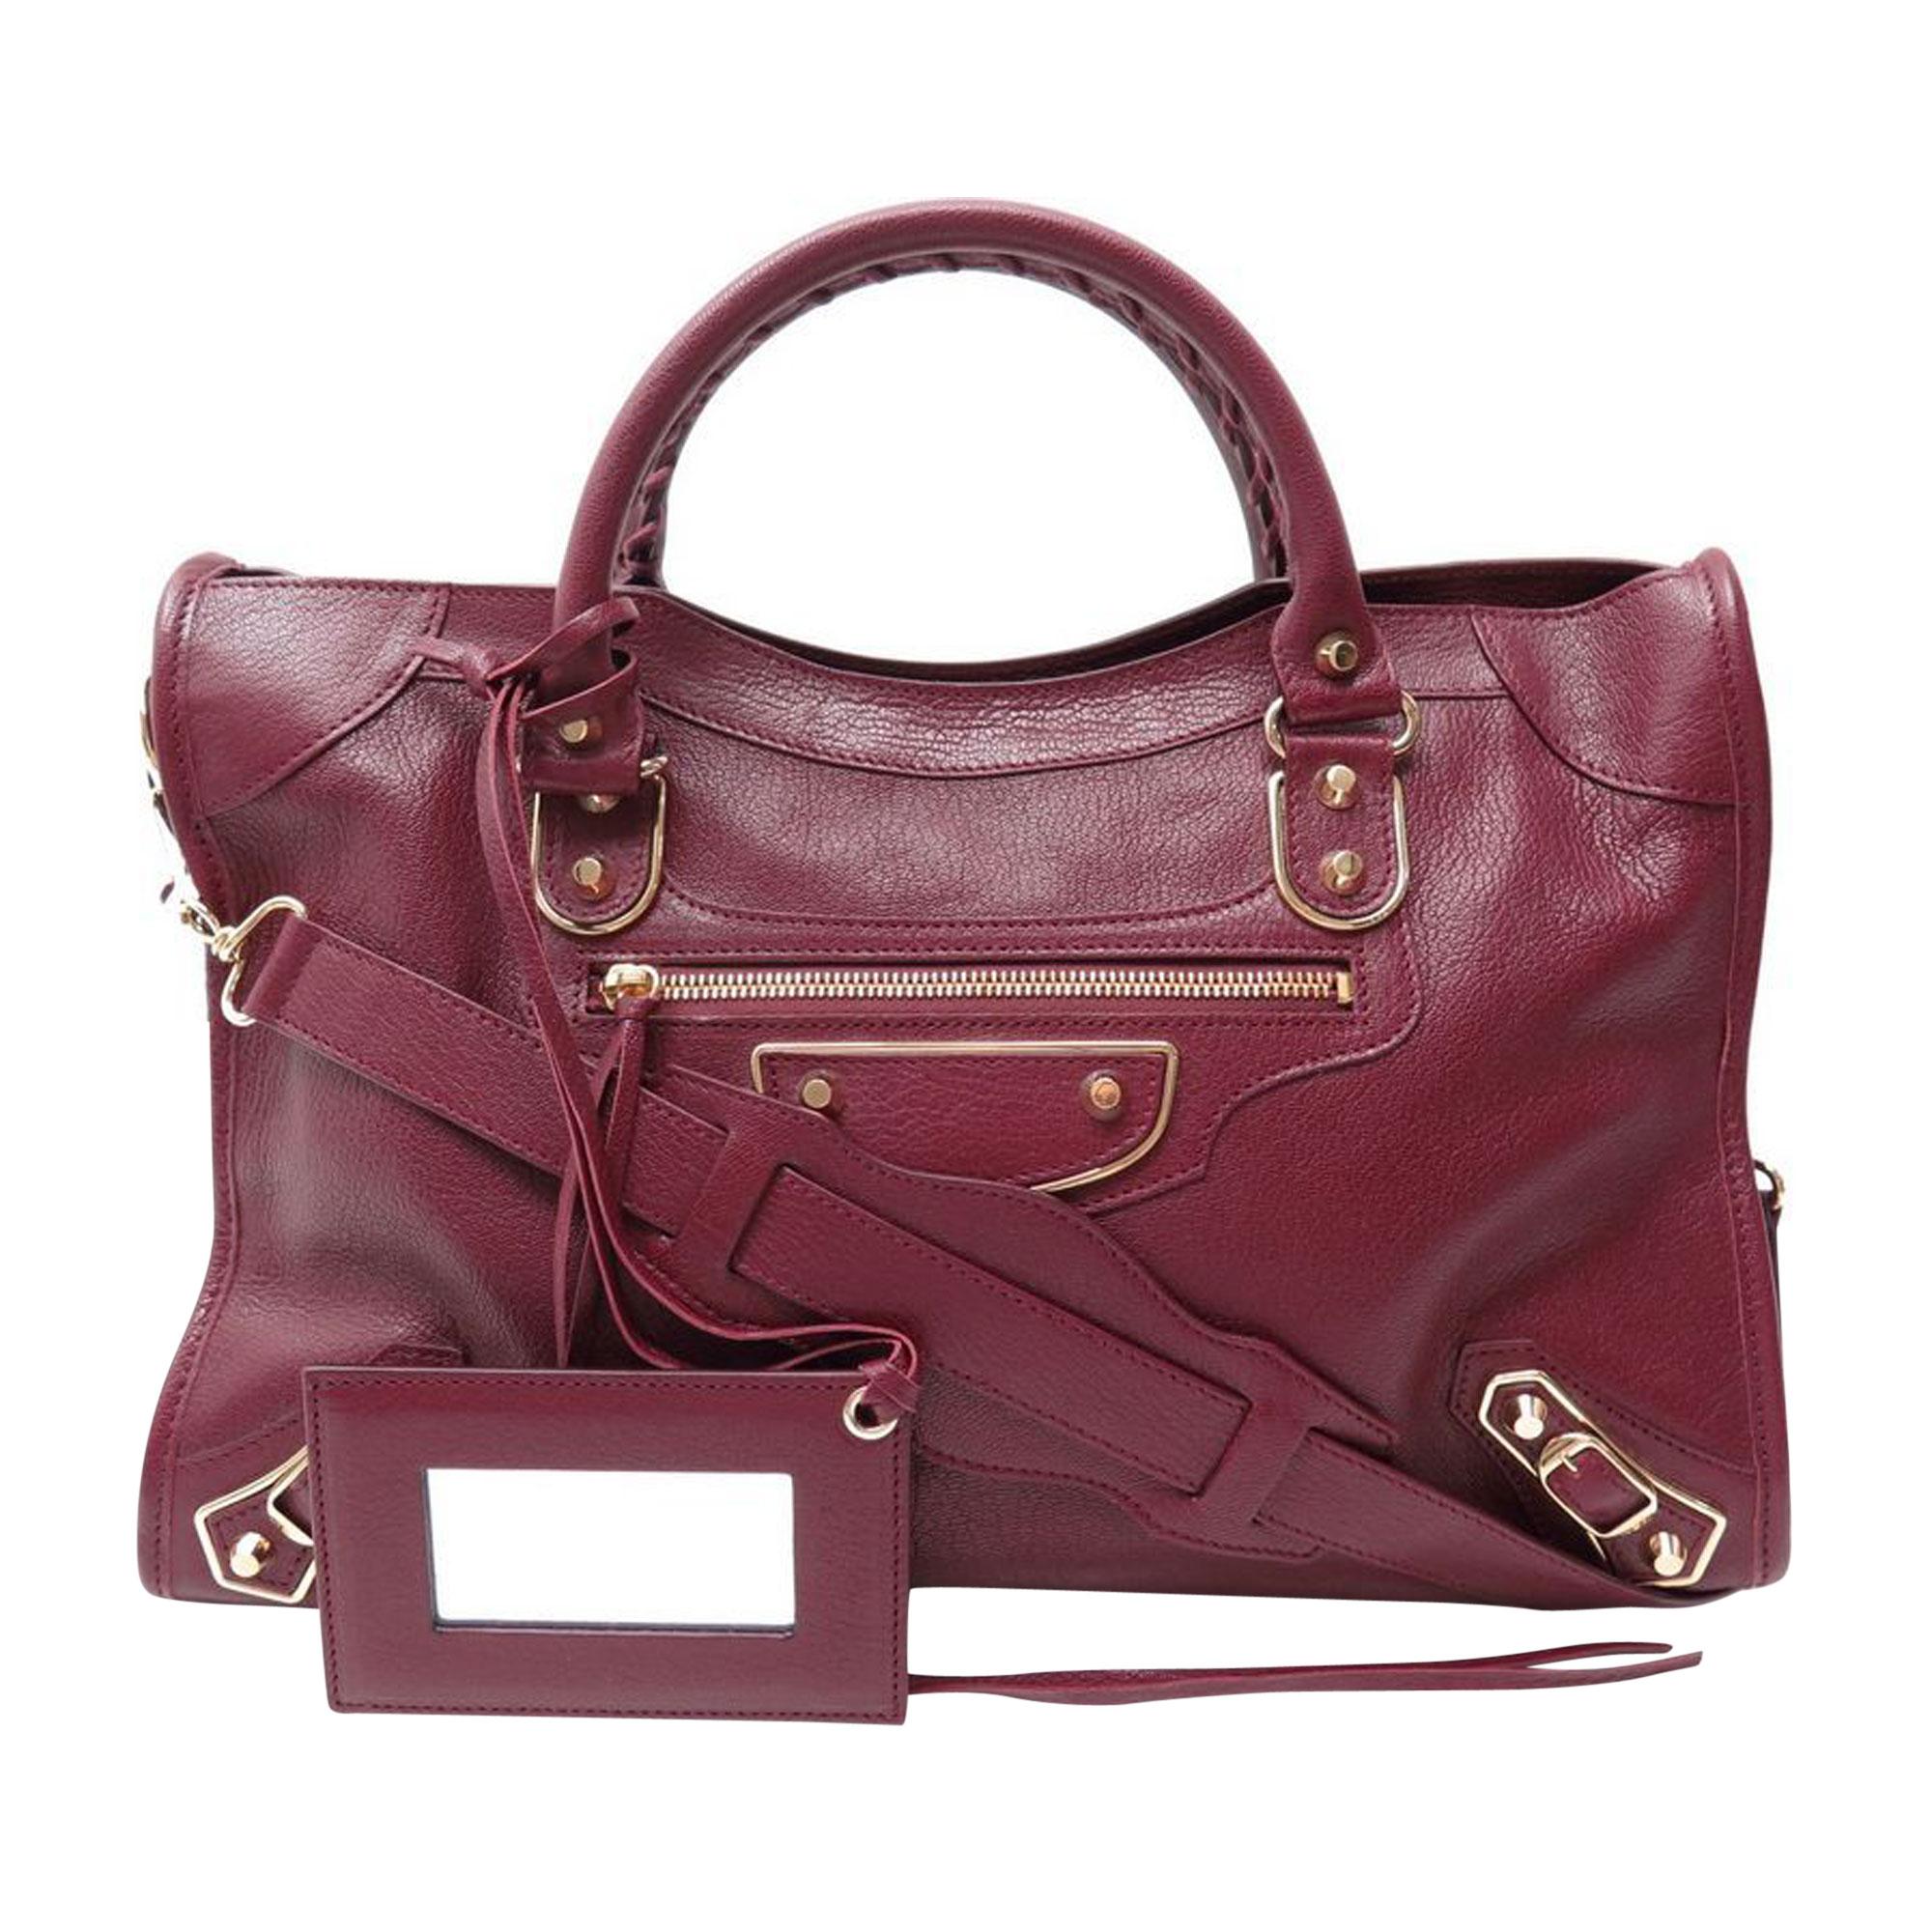 Leather Handbag BALENCIAGA Red, burgundy